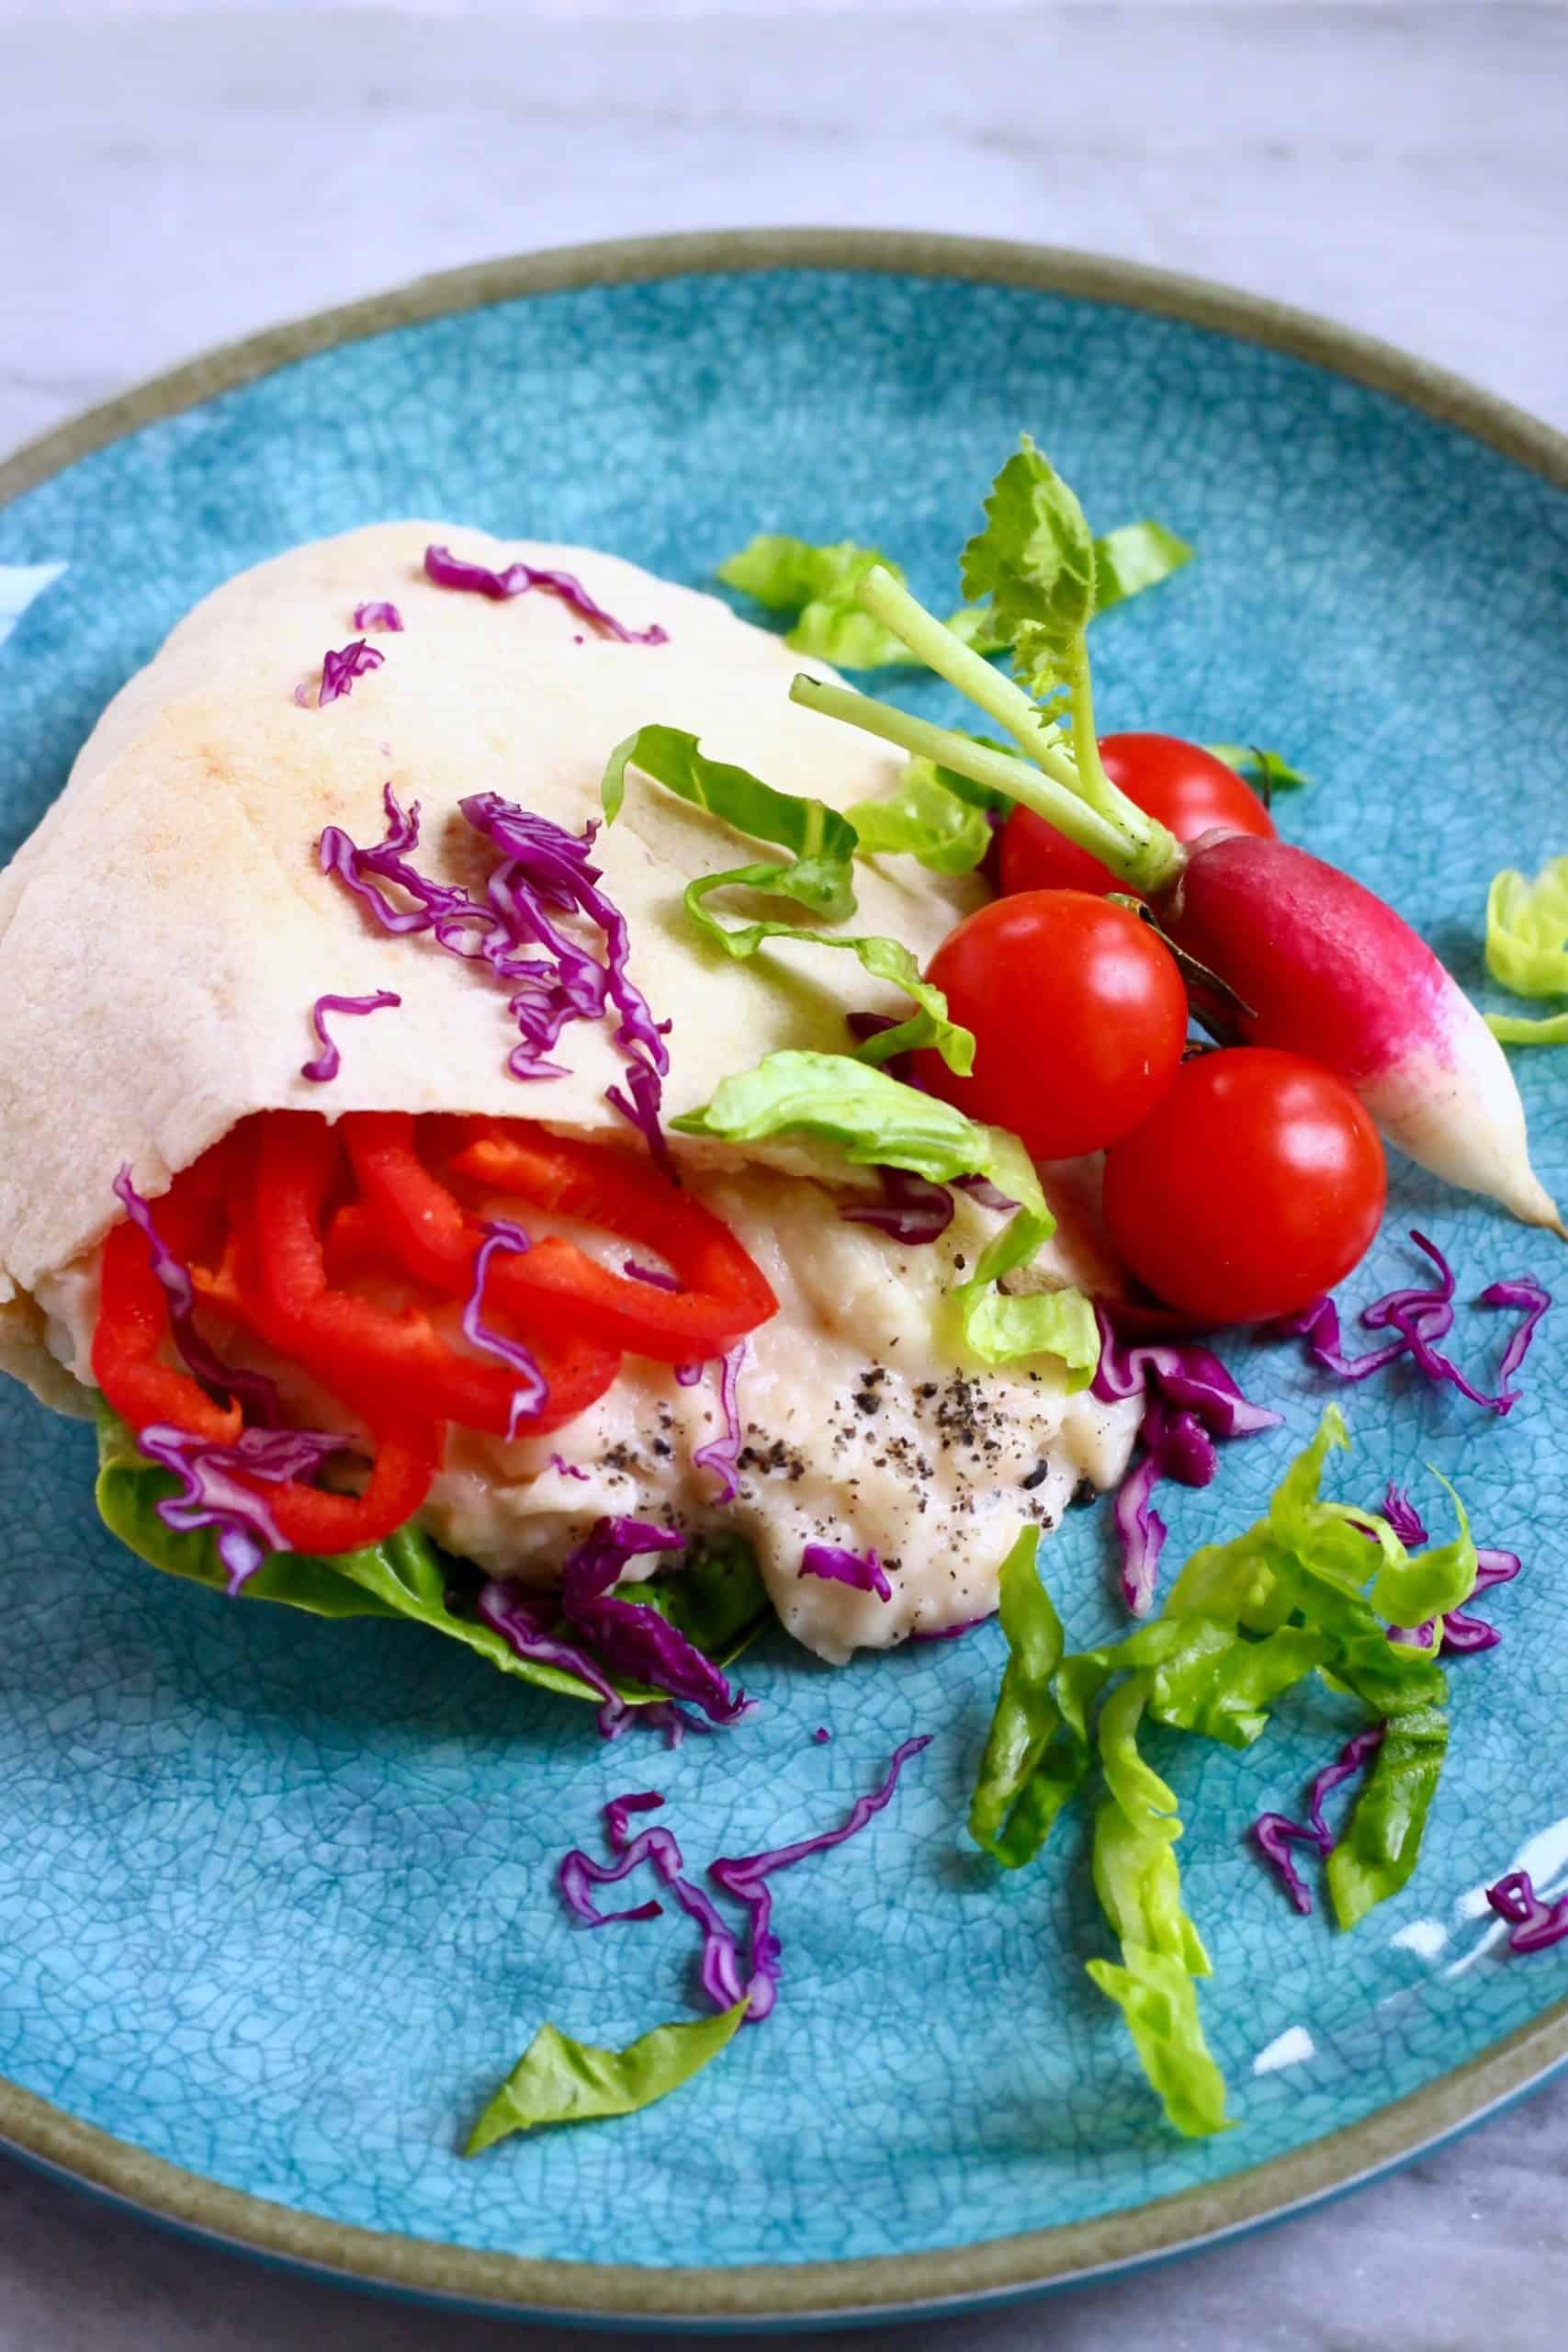 Vegan white bean tuna salad sandwich in a pitta on a blue plate